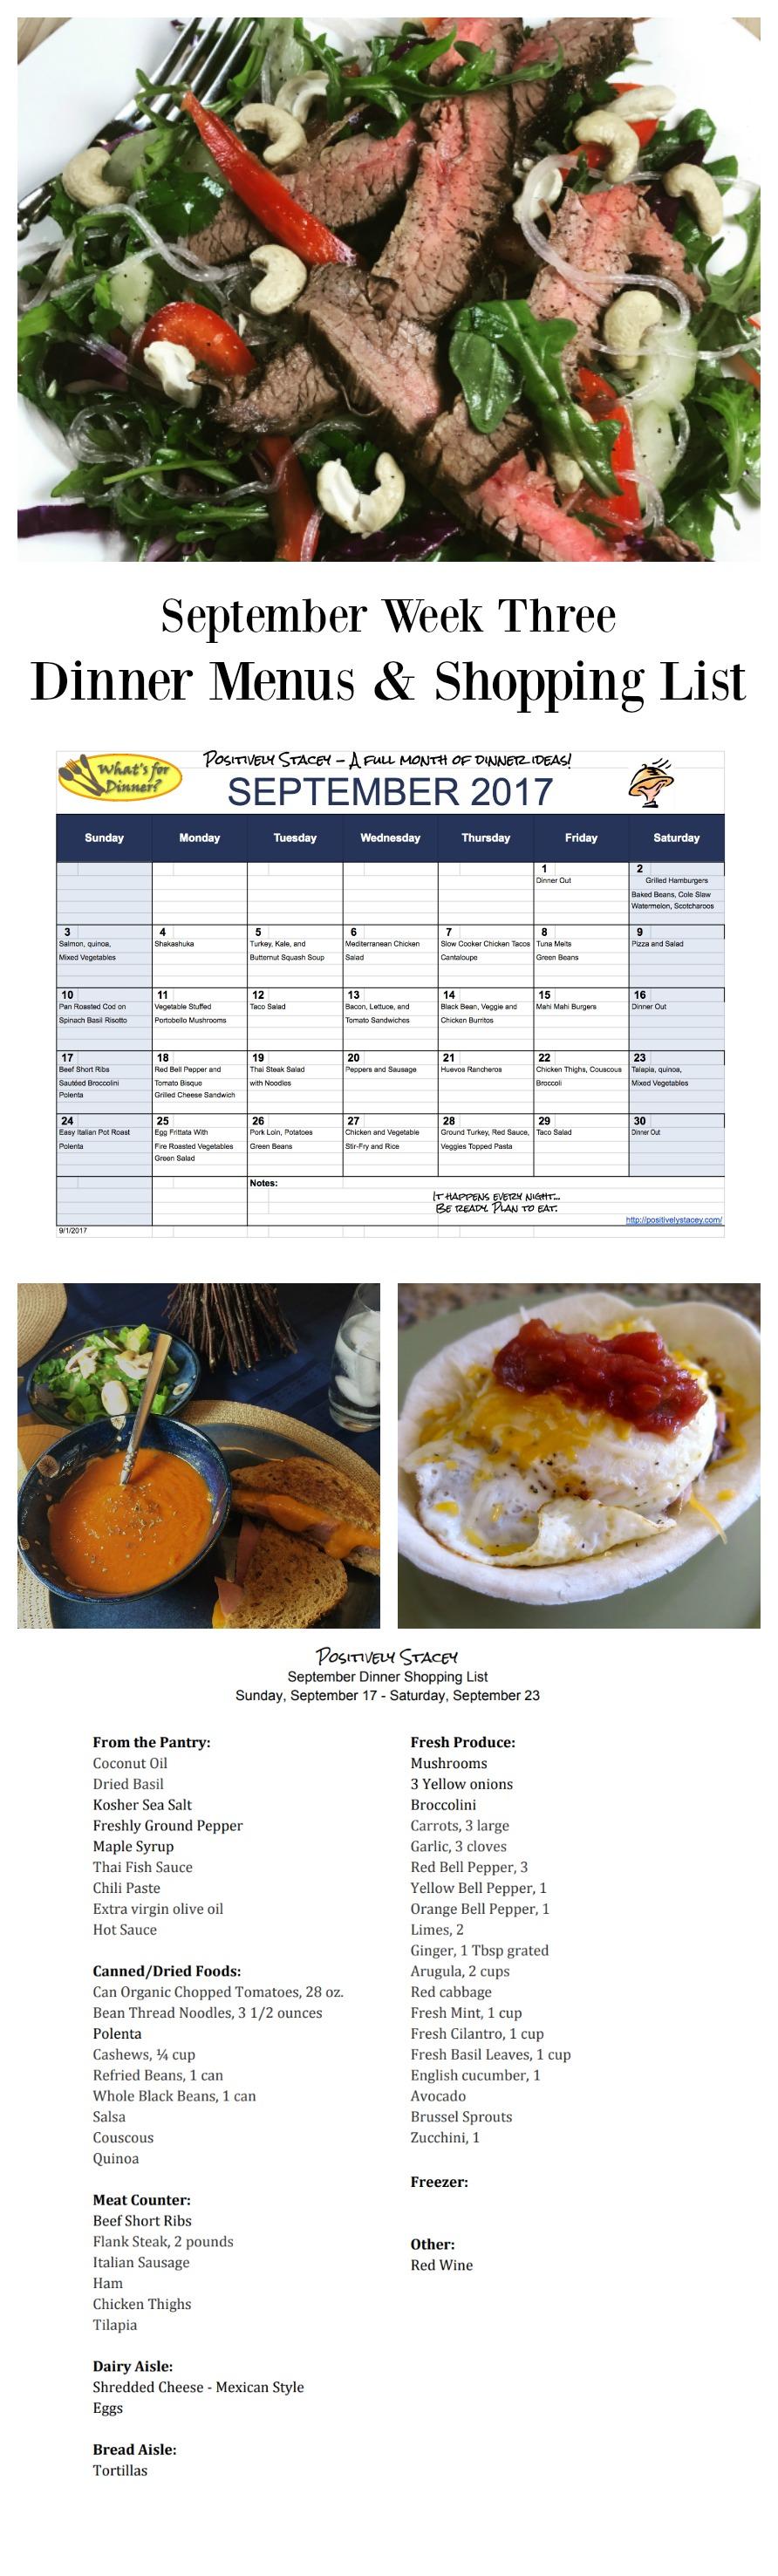 September Week Three Dinner Menus and Shopping List